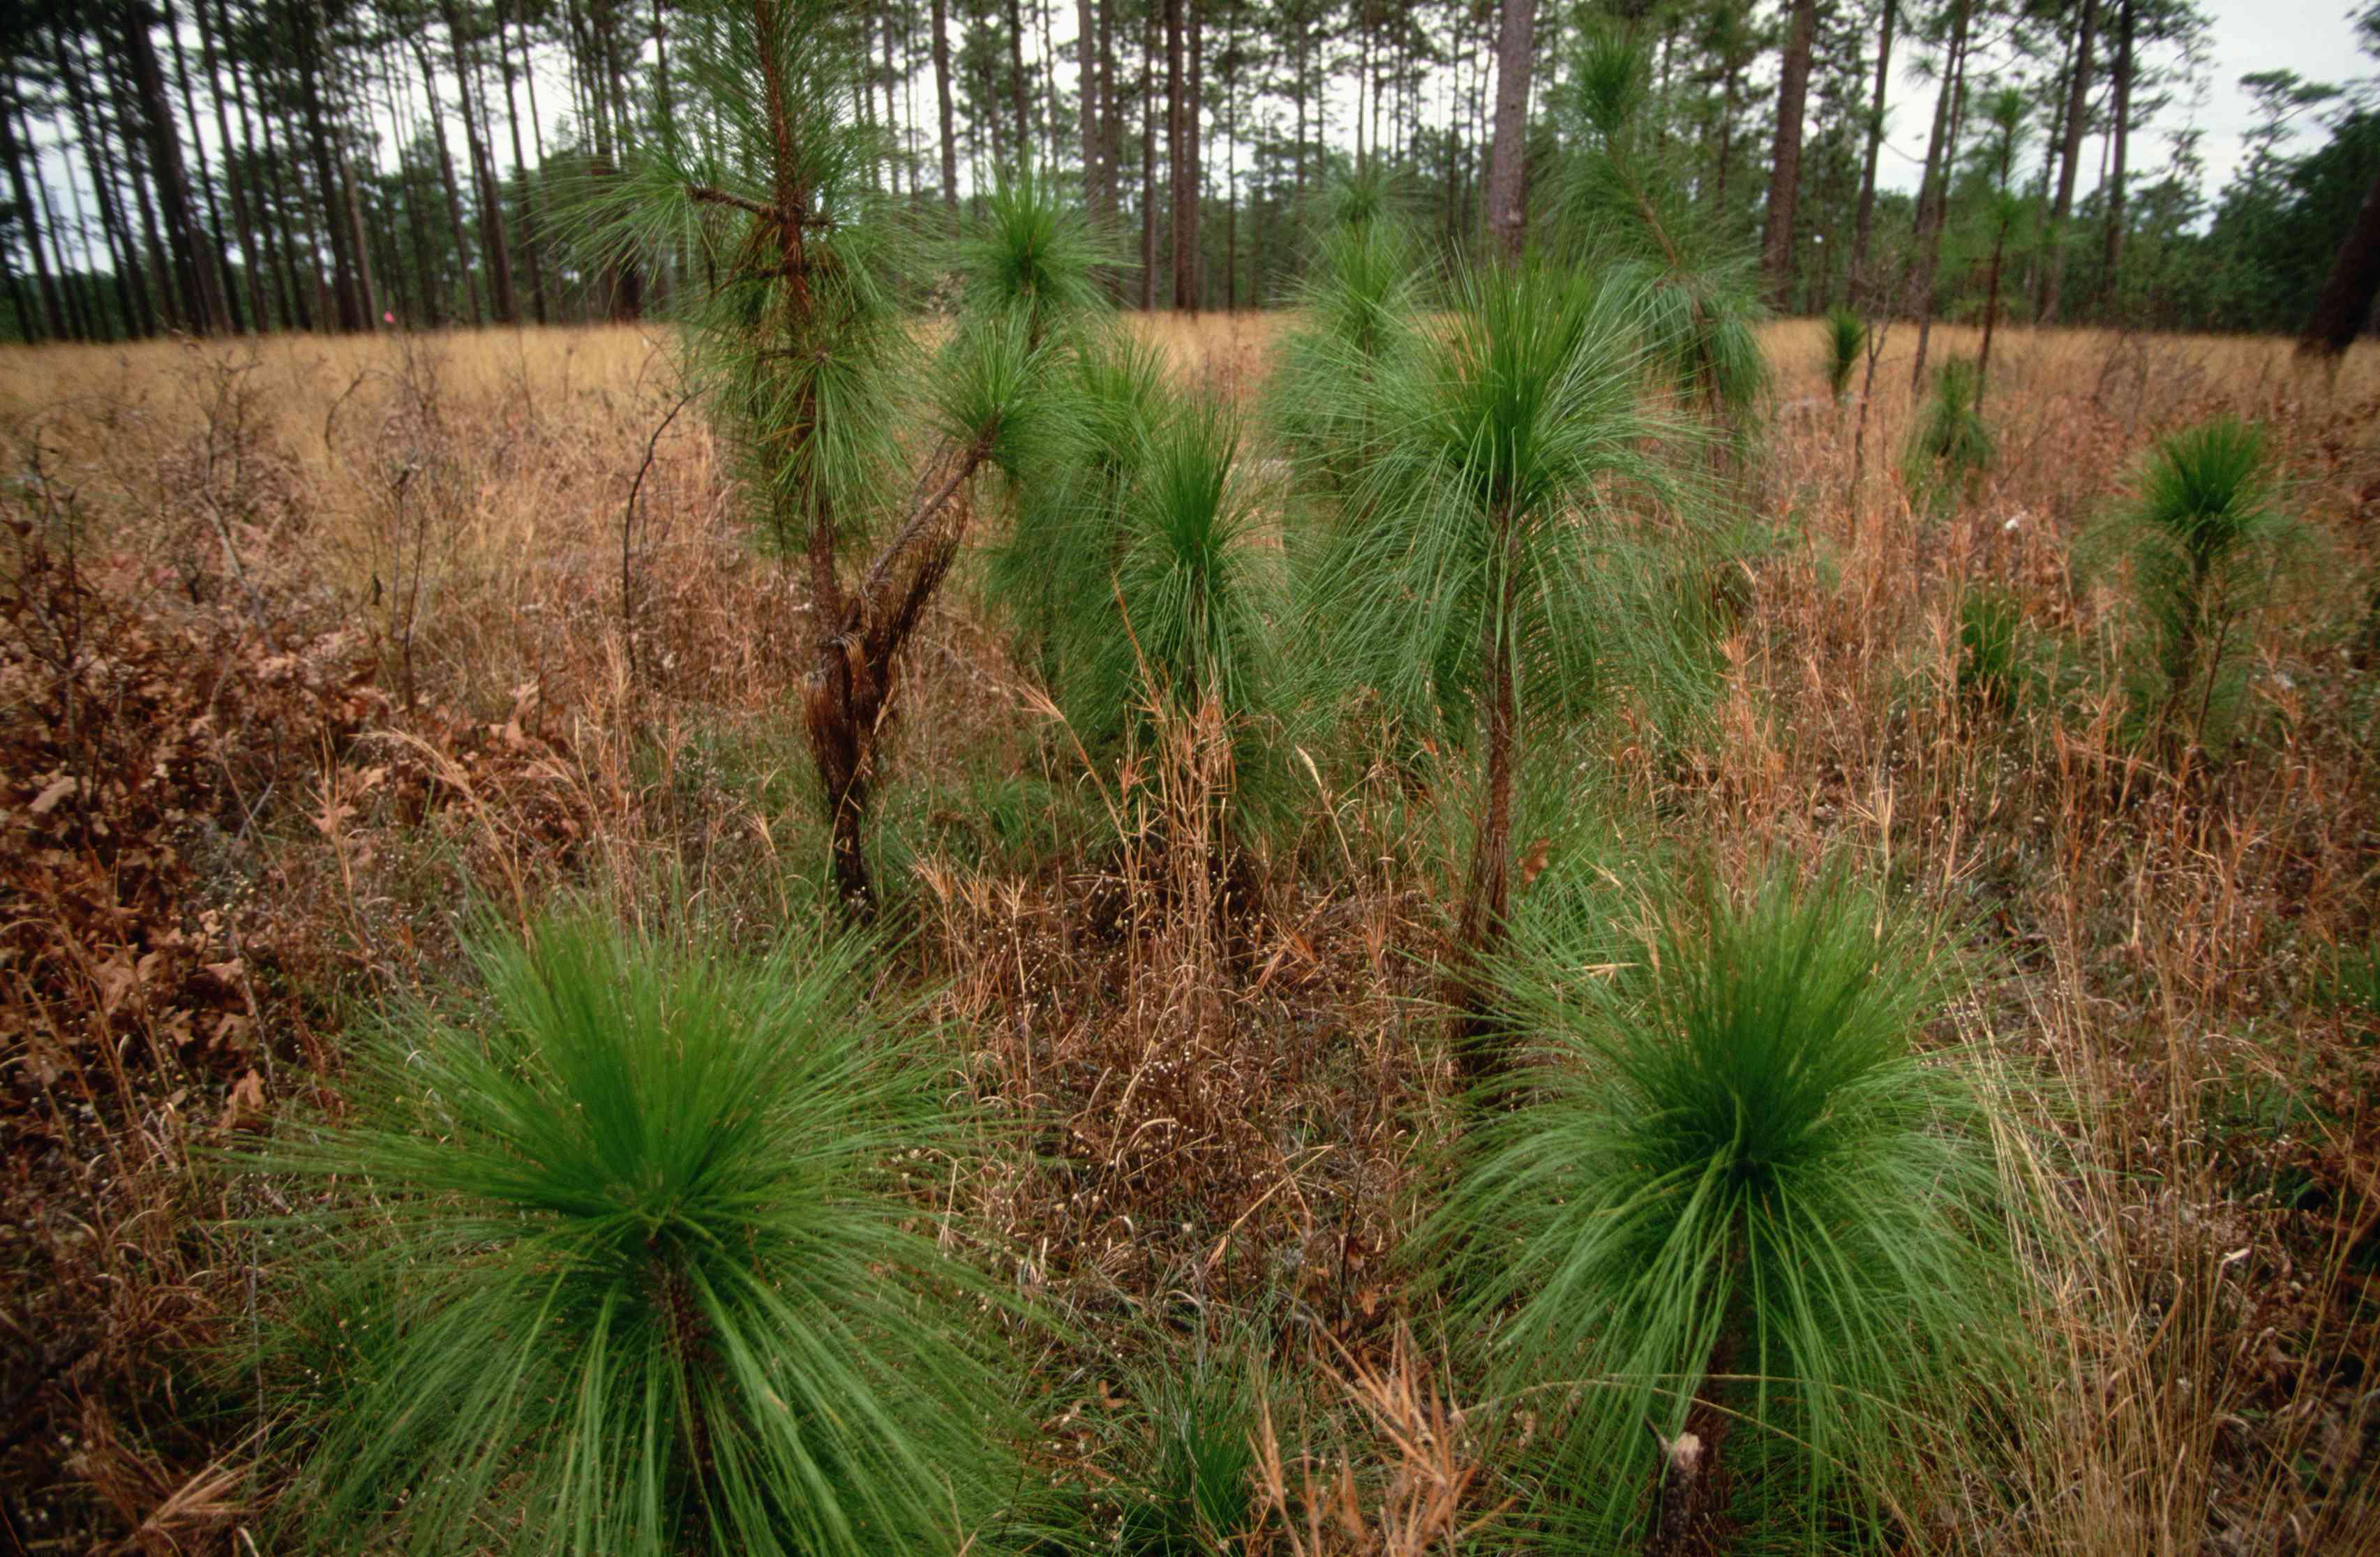 Longleaf Pine and Seedlings